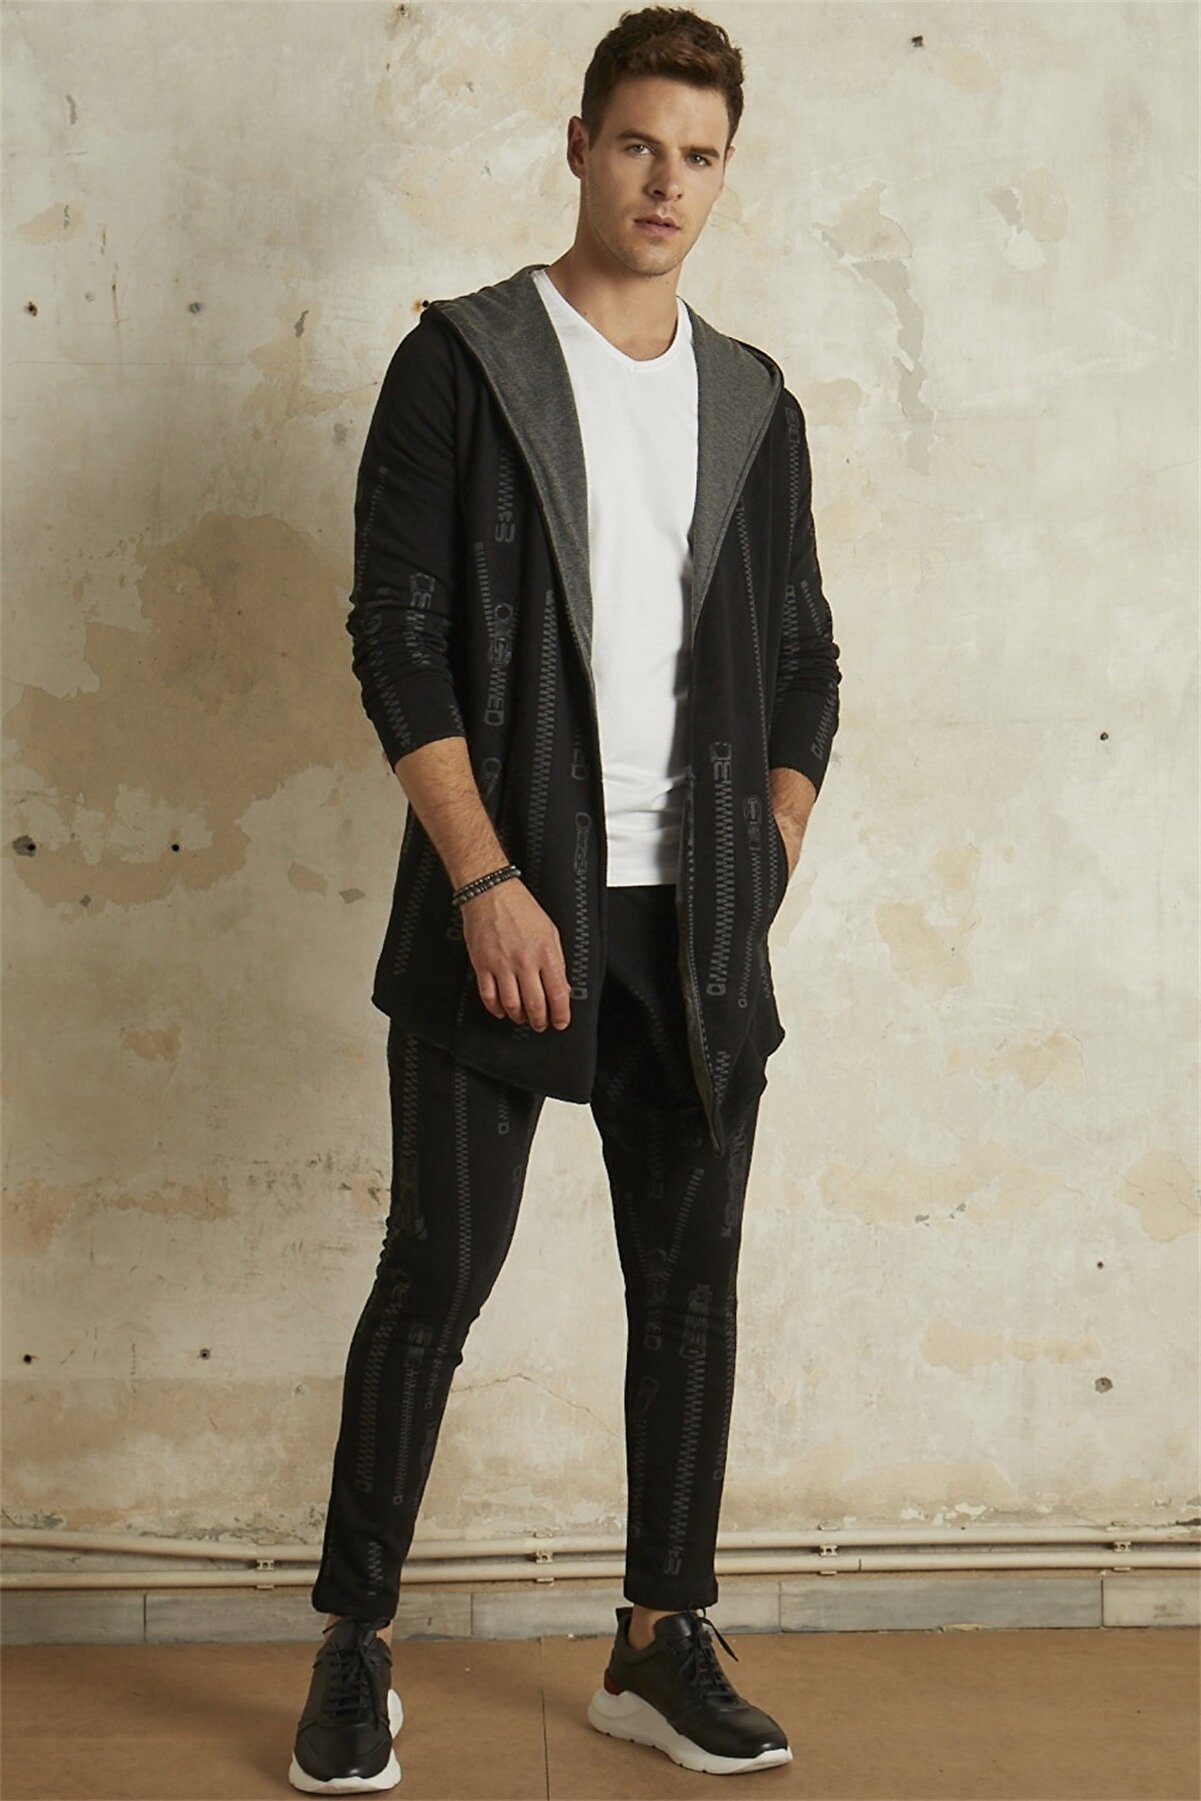 Efor Atp 010 Slim Fit Siyah Spor Pantolon